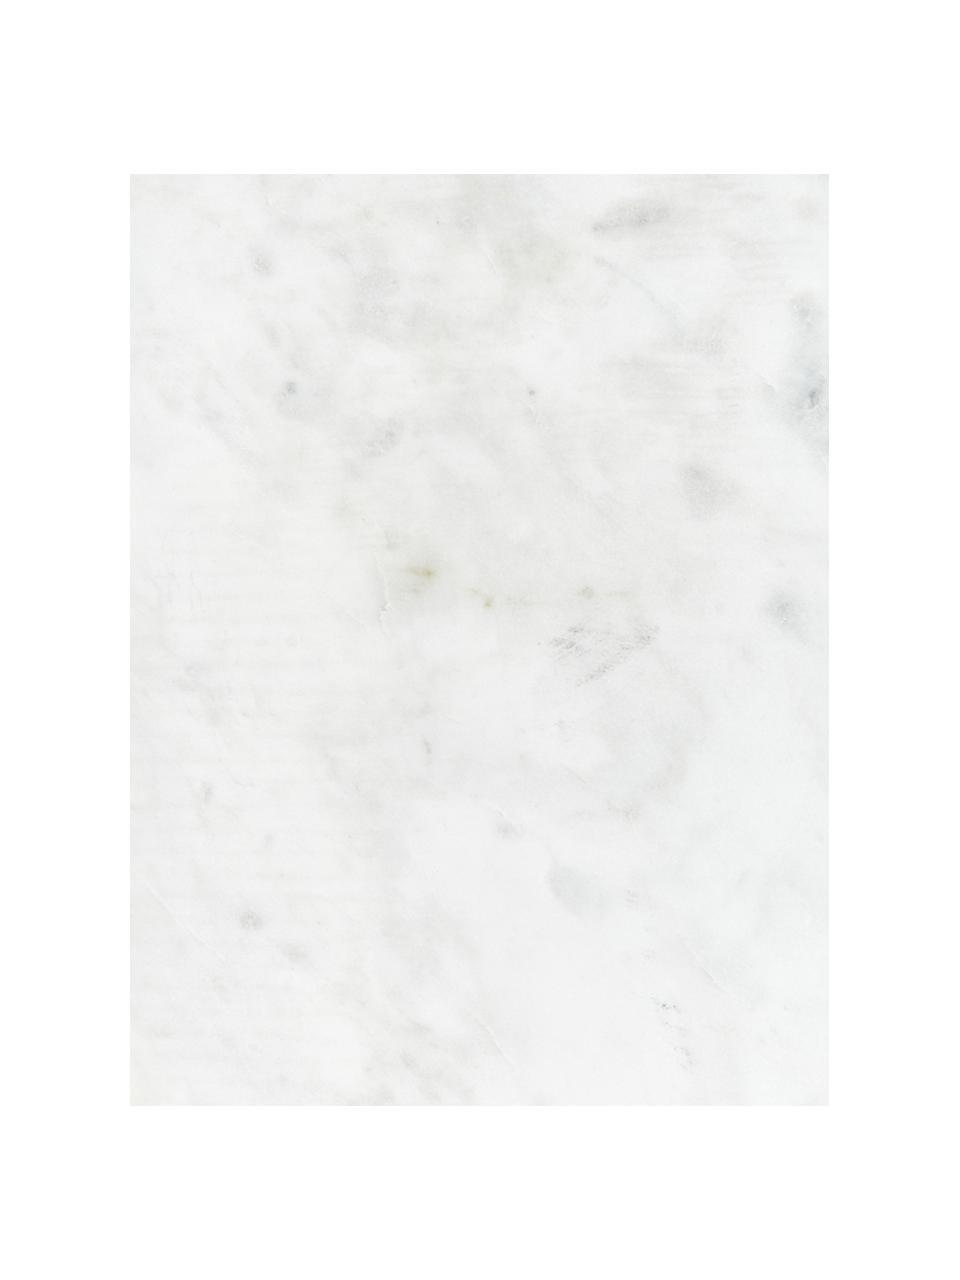 Marmor-Wandregal Porter, Regalboden: Marmor, Weißer Marmor, Goldfarben, 60 x 16 cm